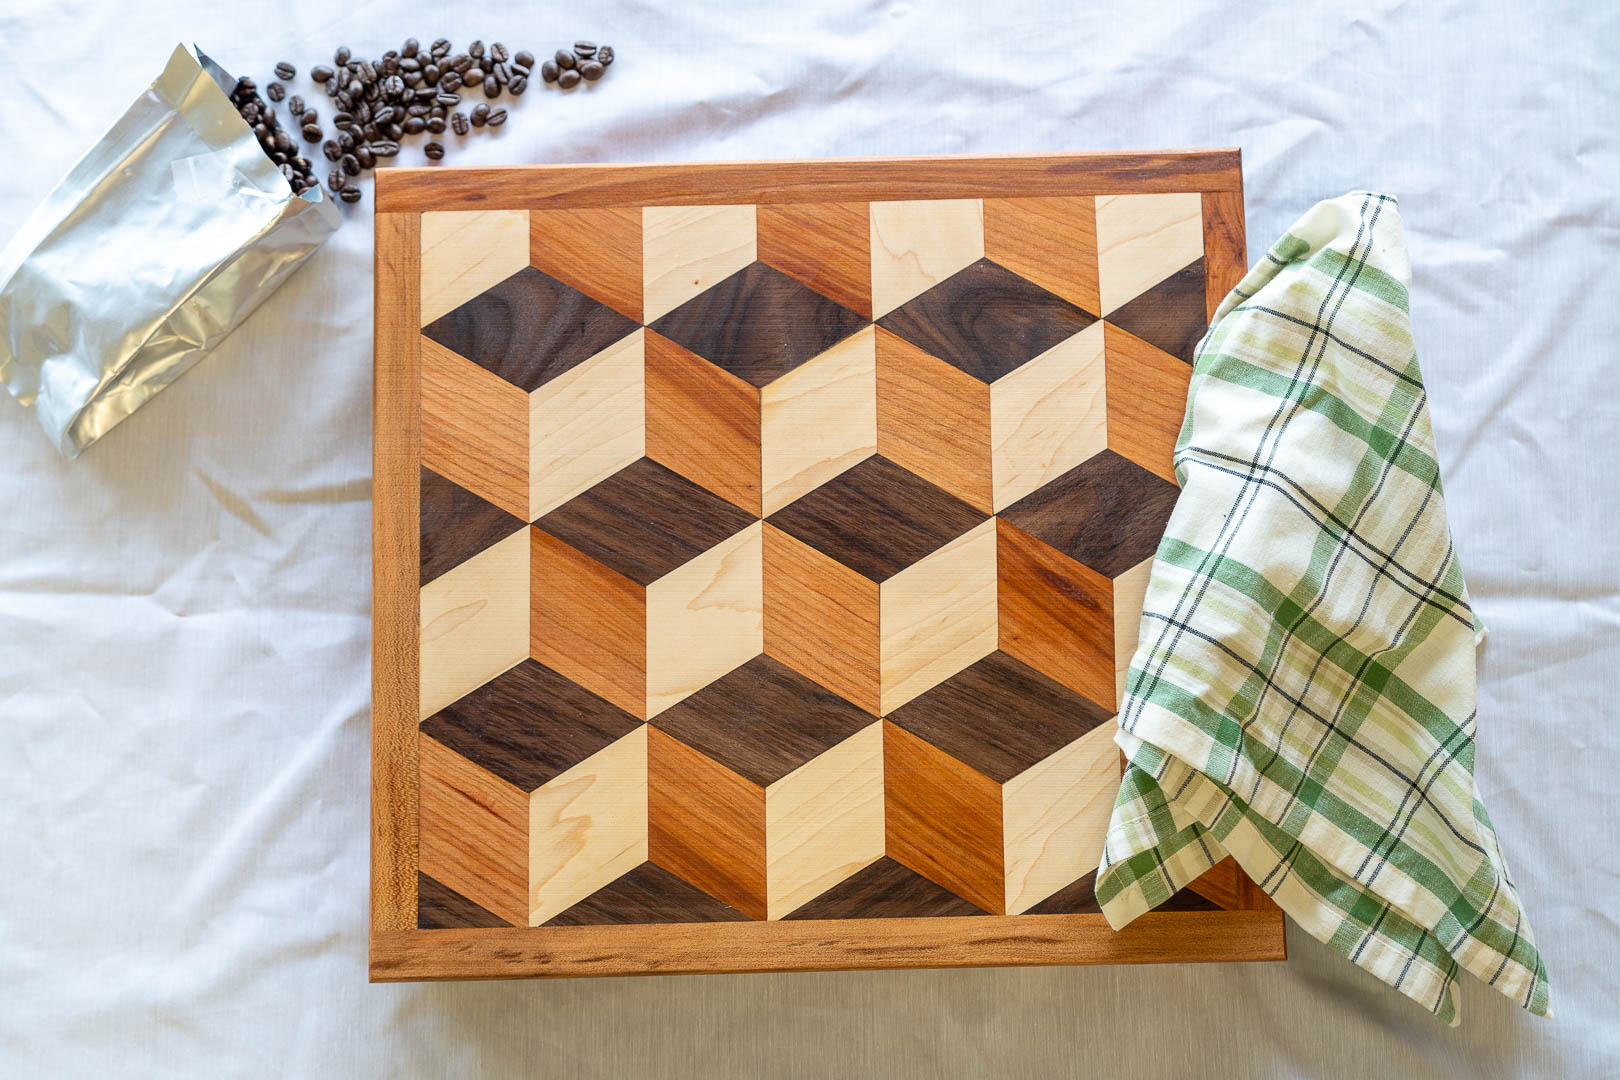 Hexagon Geometric Design Cutting Board-2.jpg